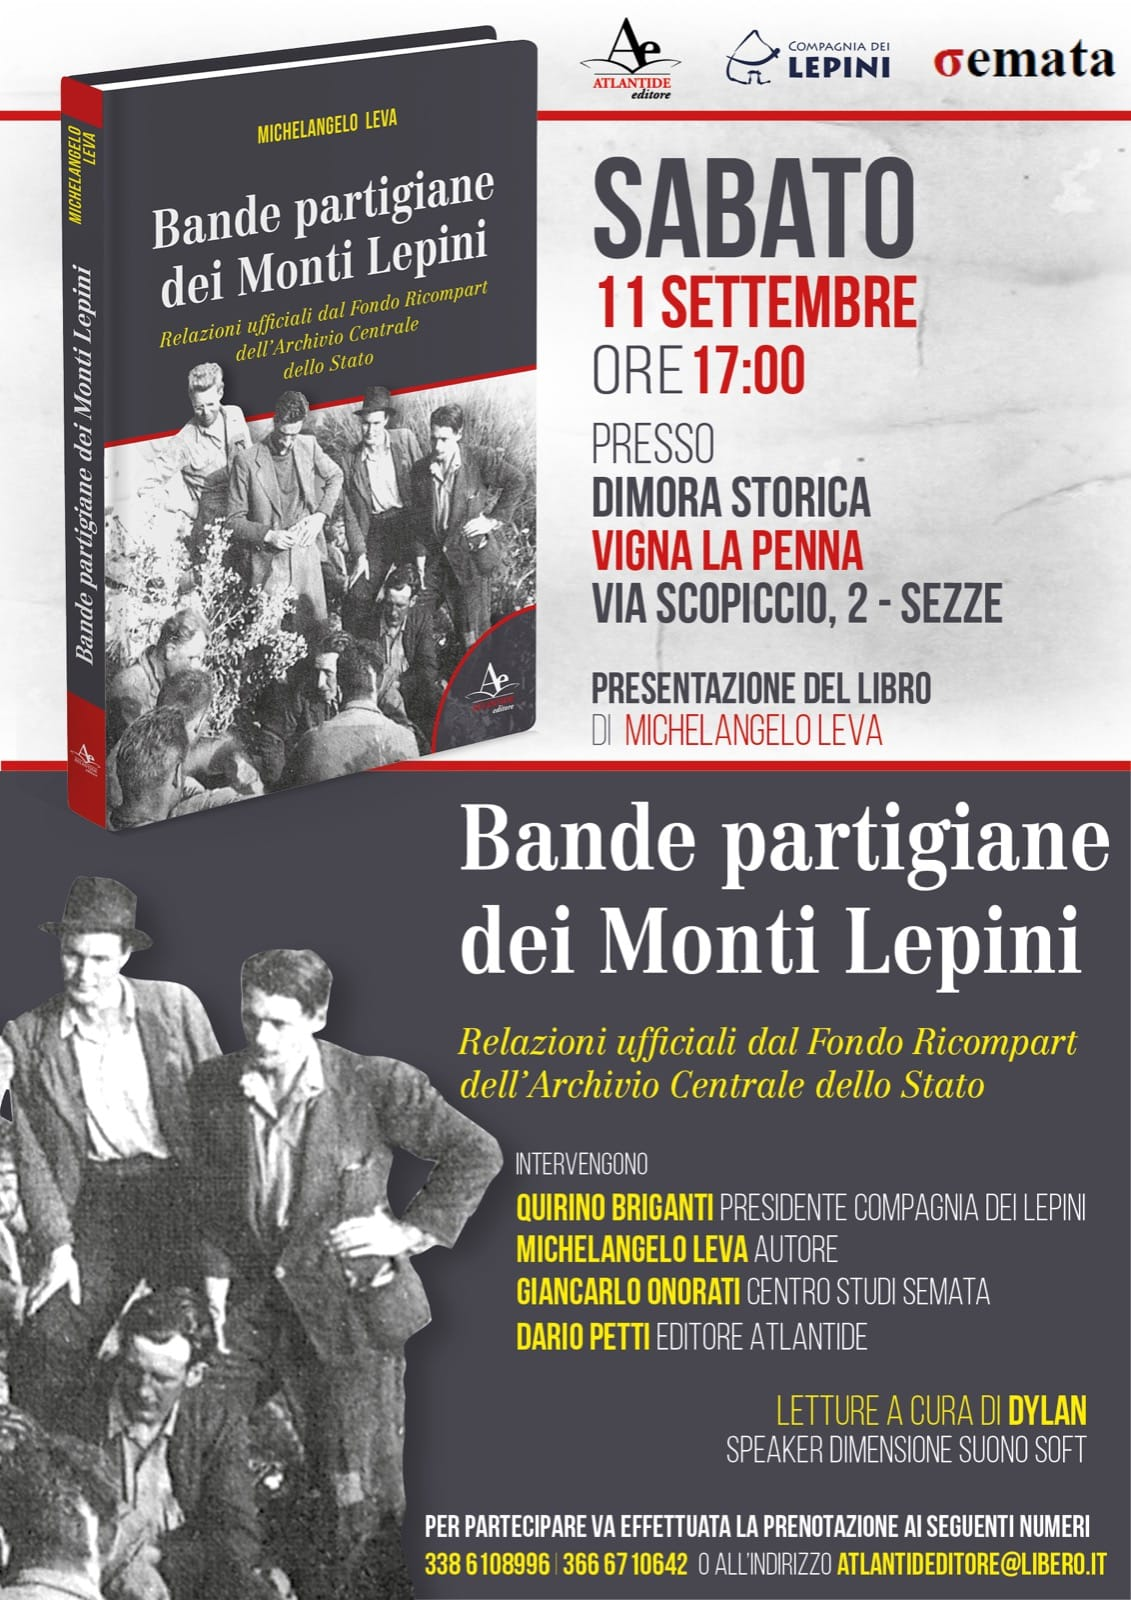 Sezze: Bande partigiane dei Monti Lepini @ Dimora Storica, Vigna La Penna